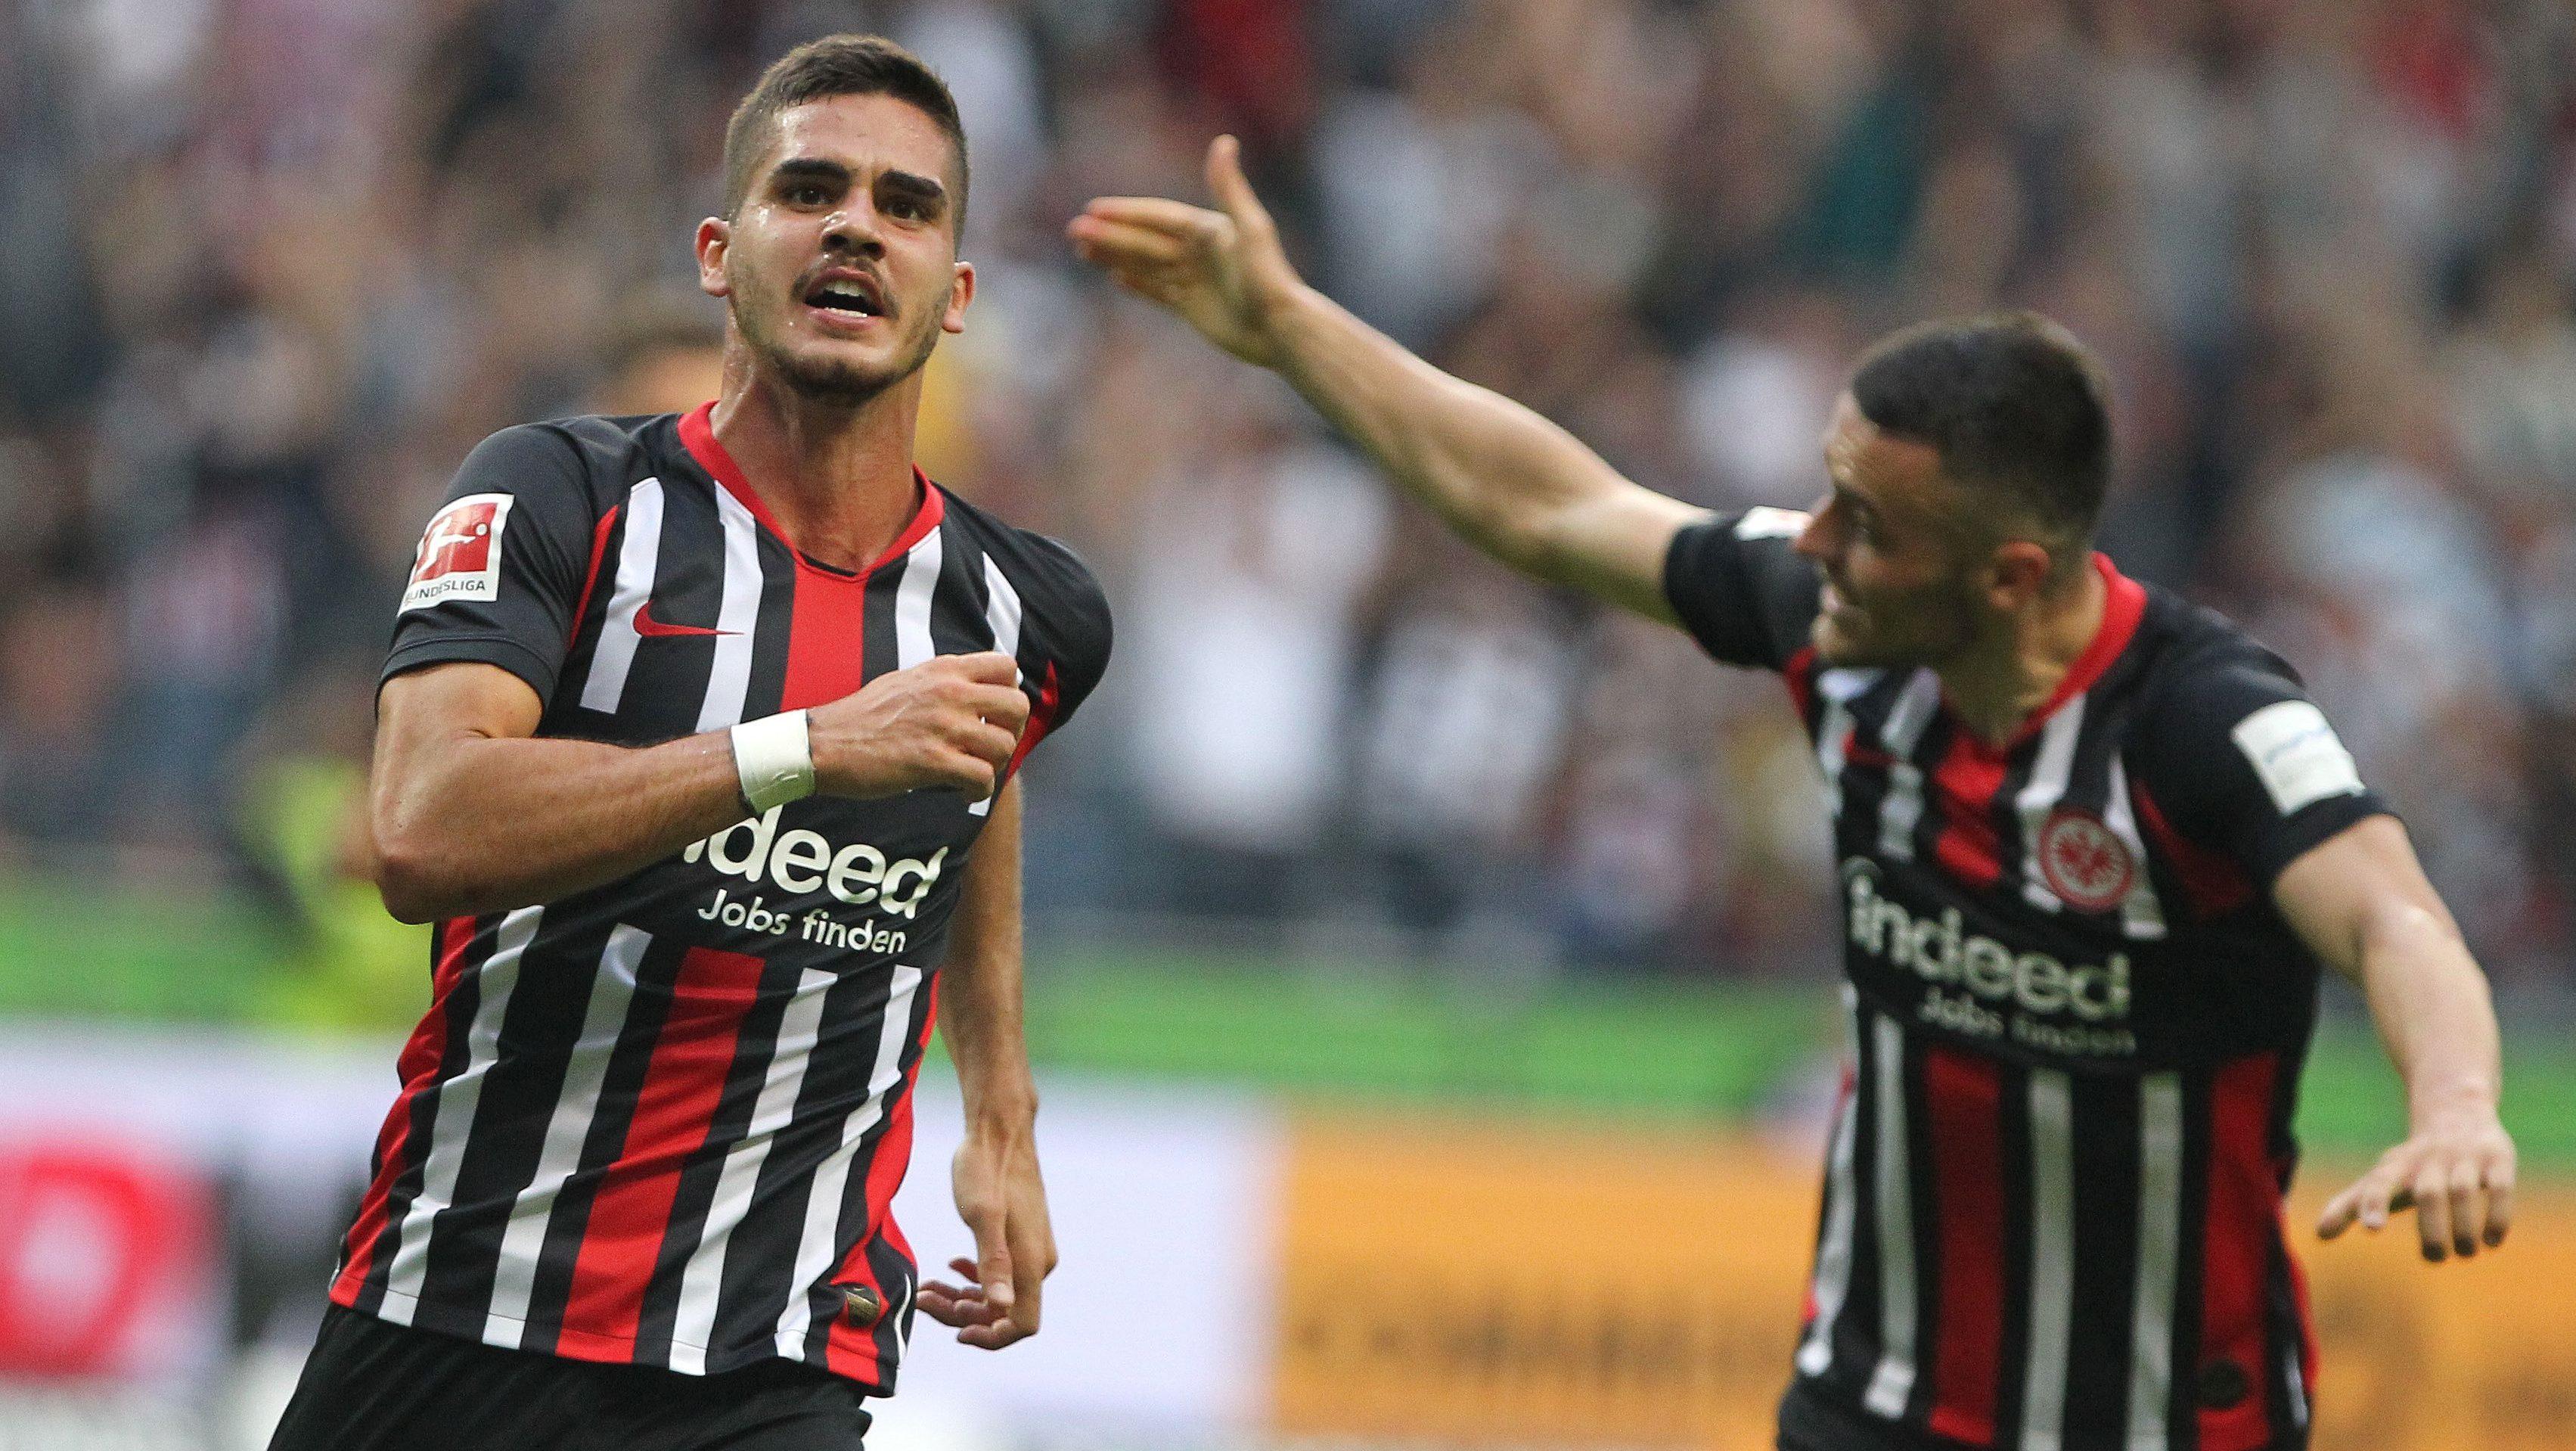 Silva scores maiden goal in dramatic Dortmund draw